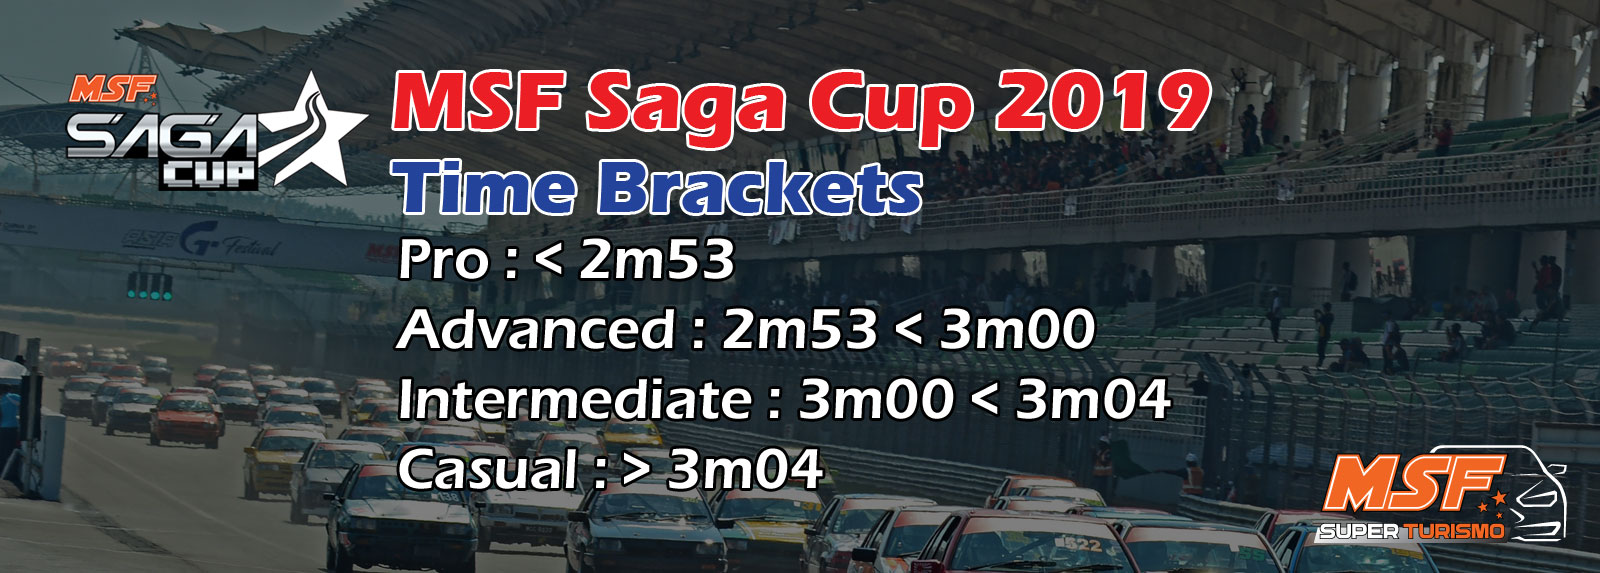 MSF Saga Cup Time Brackets 2019